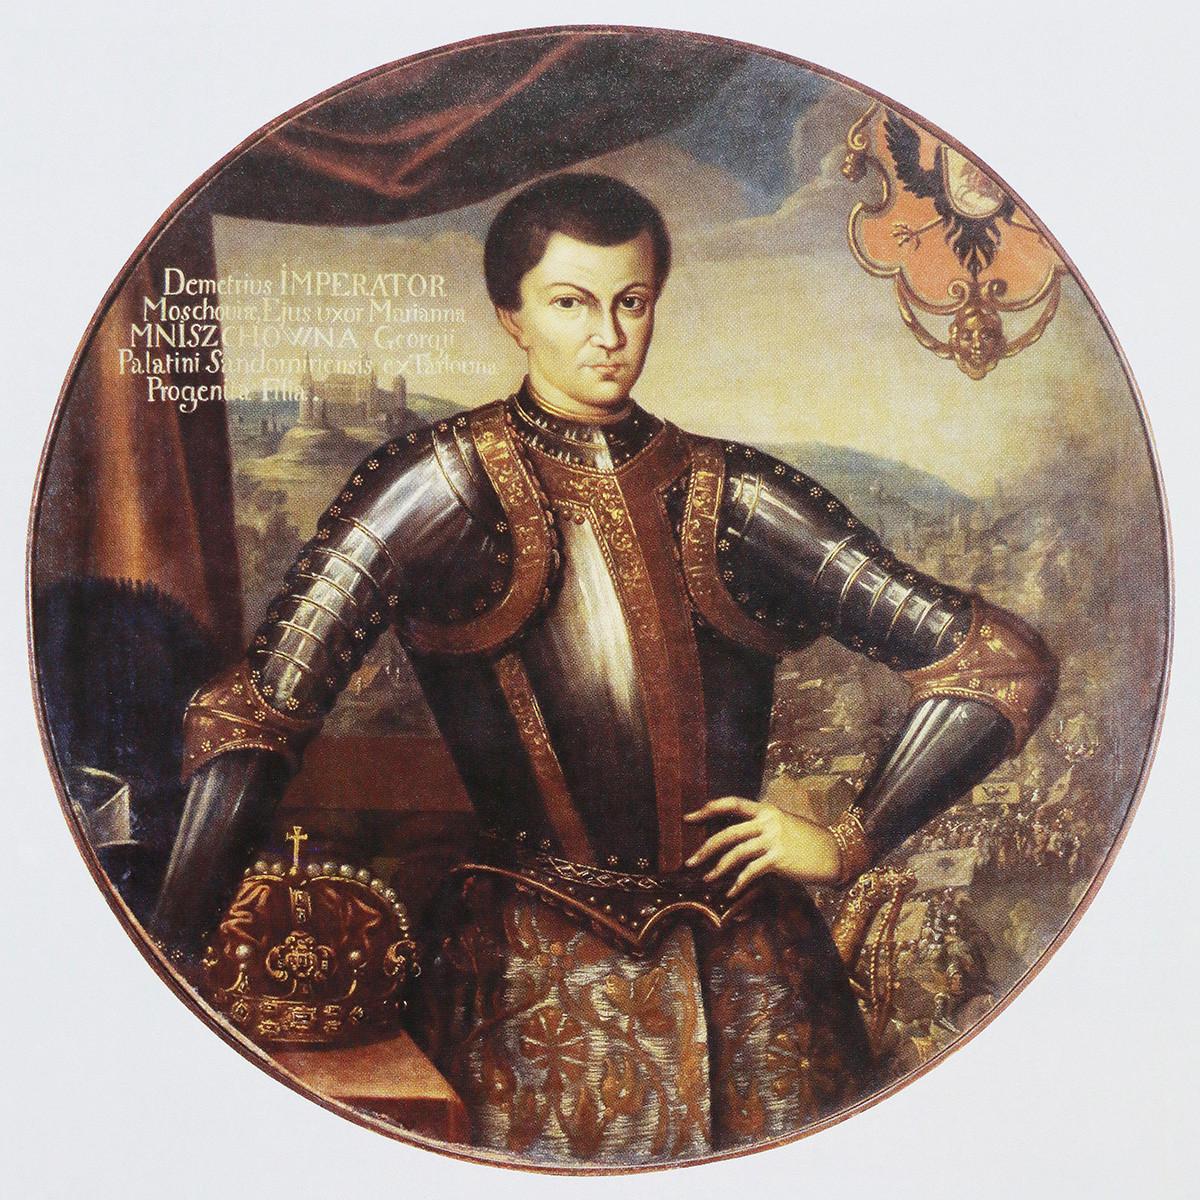 Dmitry I palsu sebagai tsar Rusia, 1606